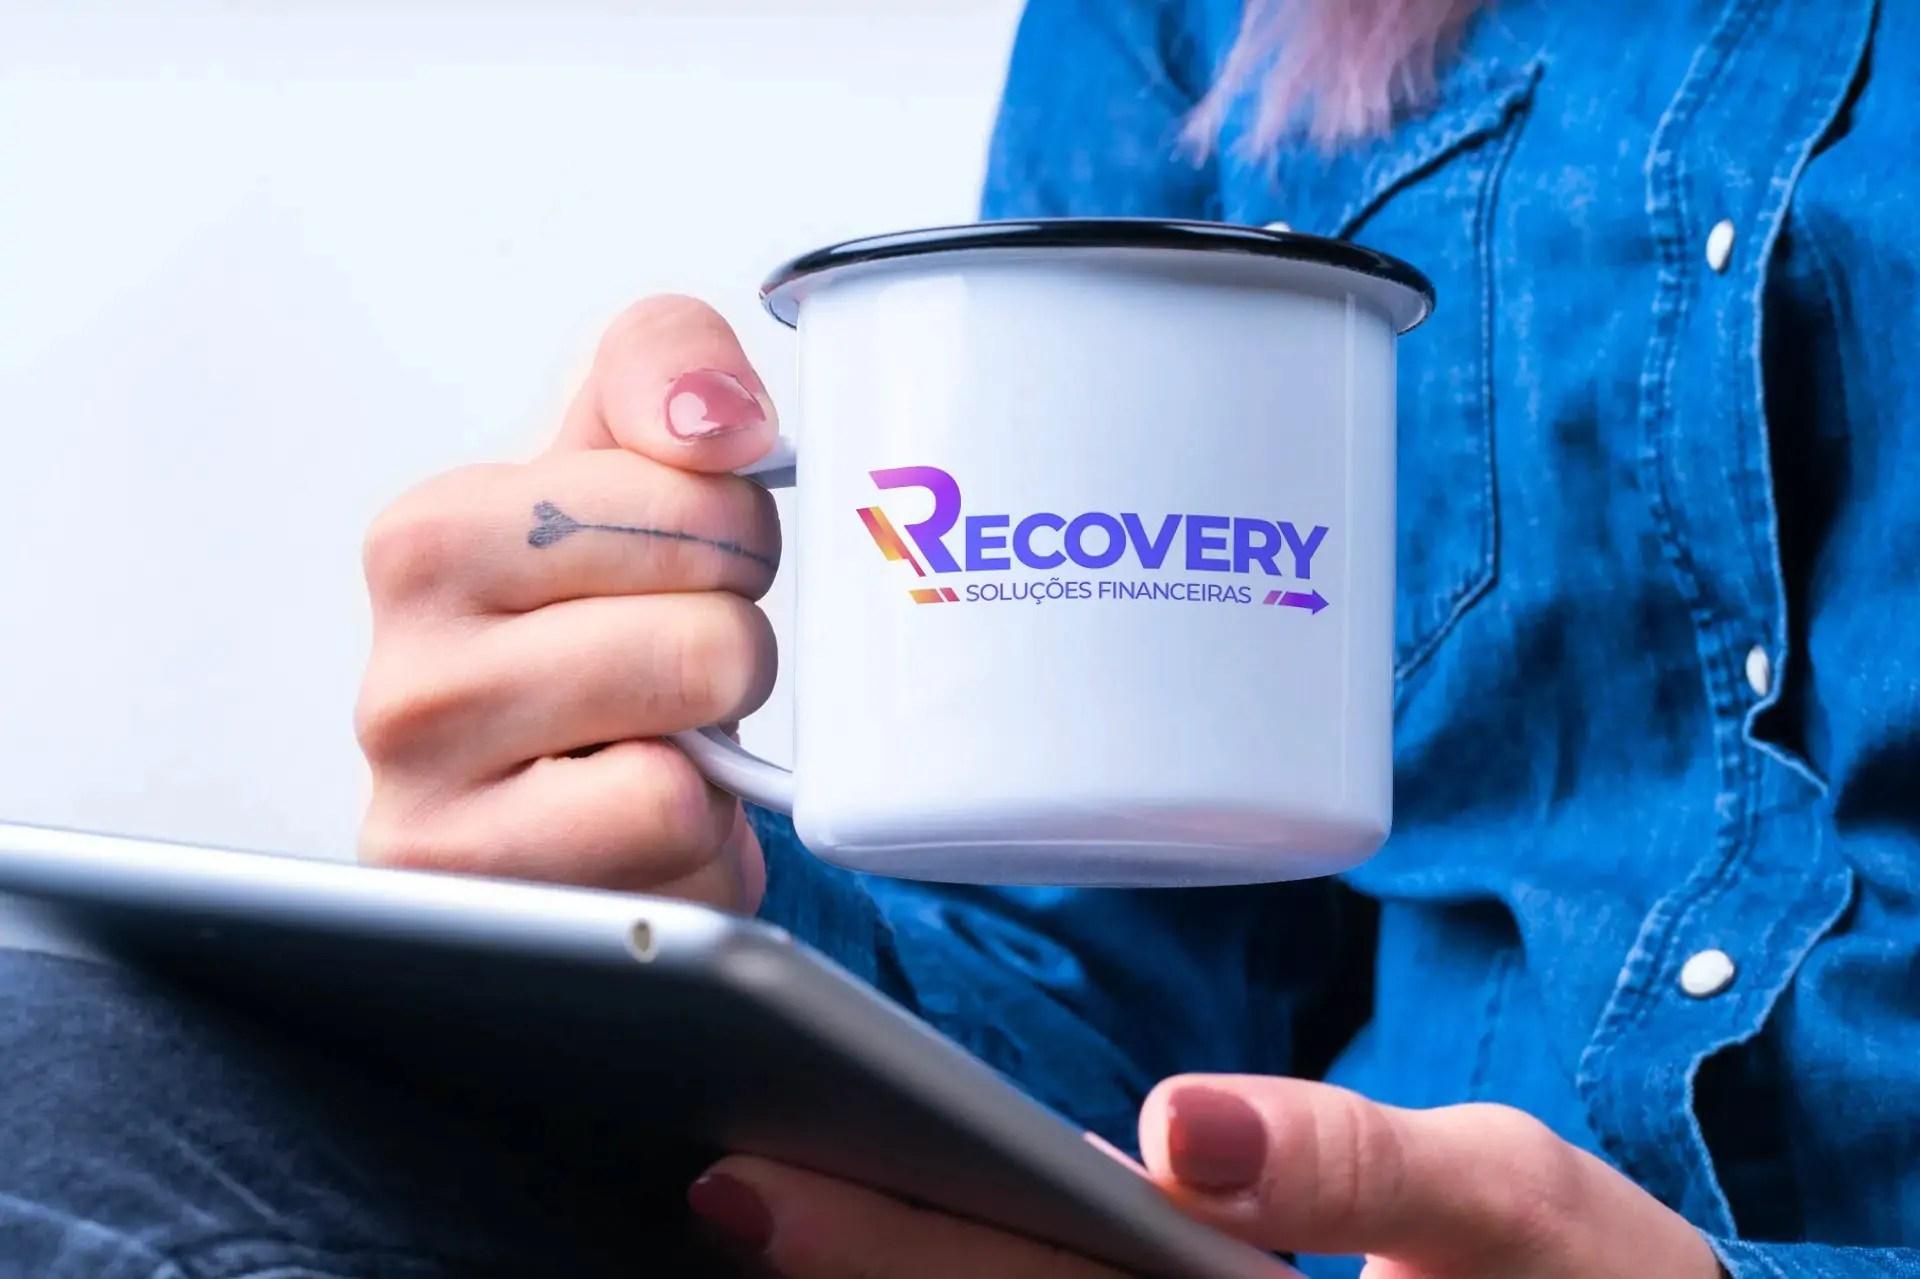 logo recovery